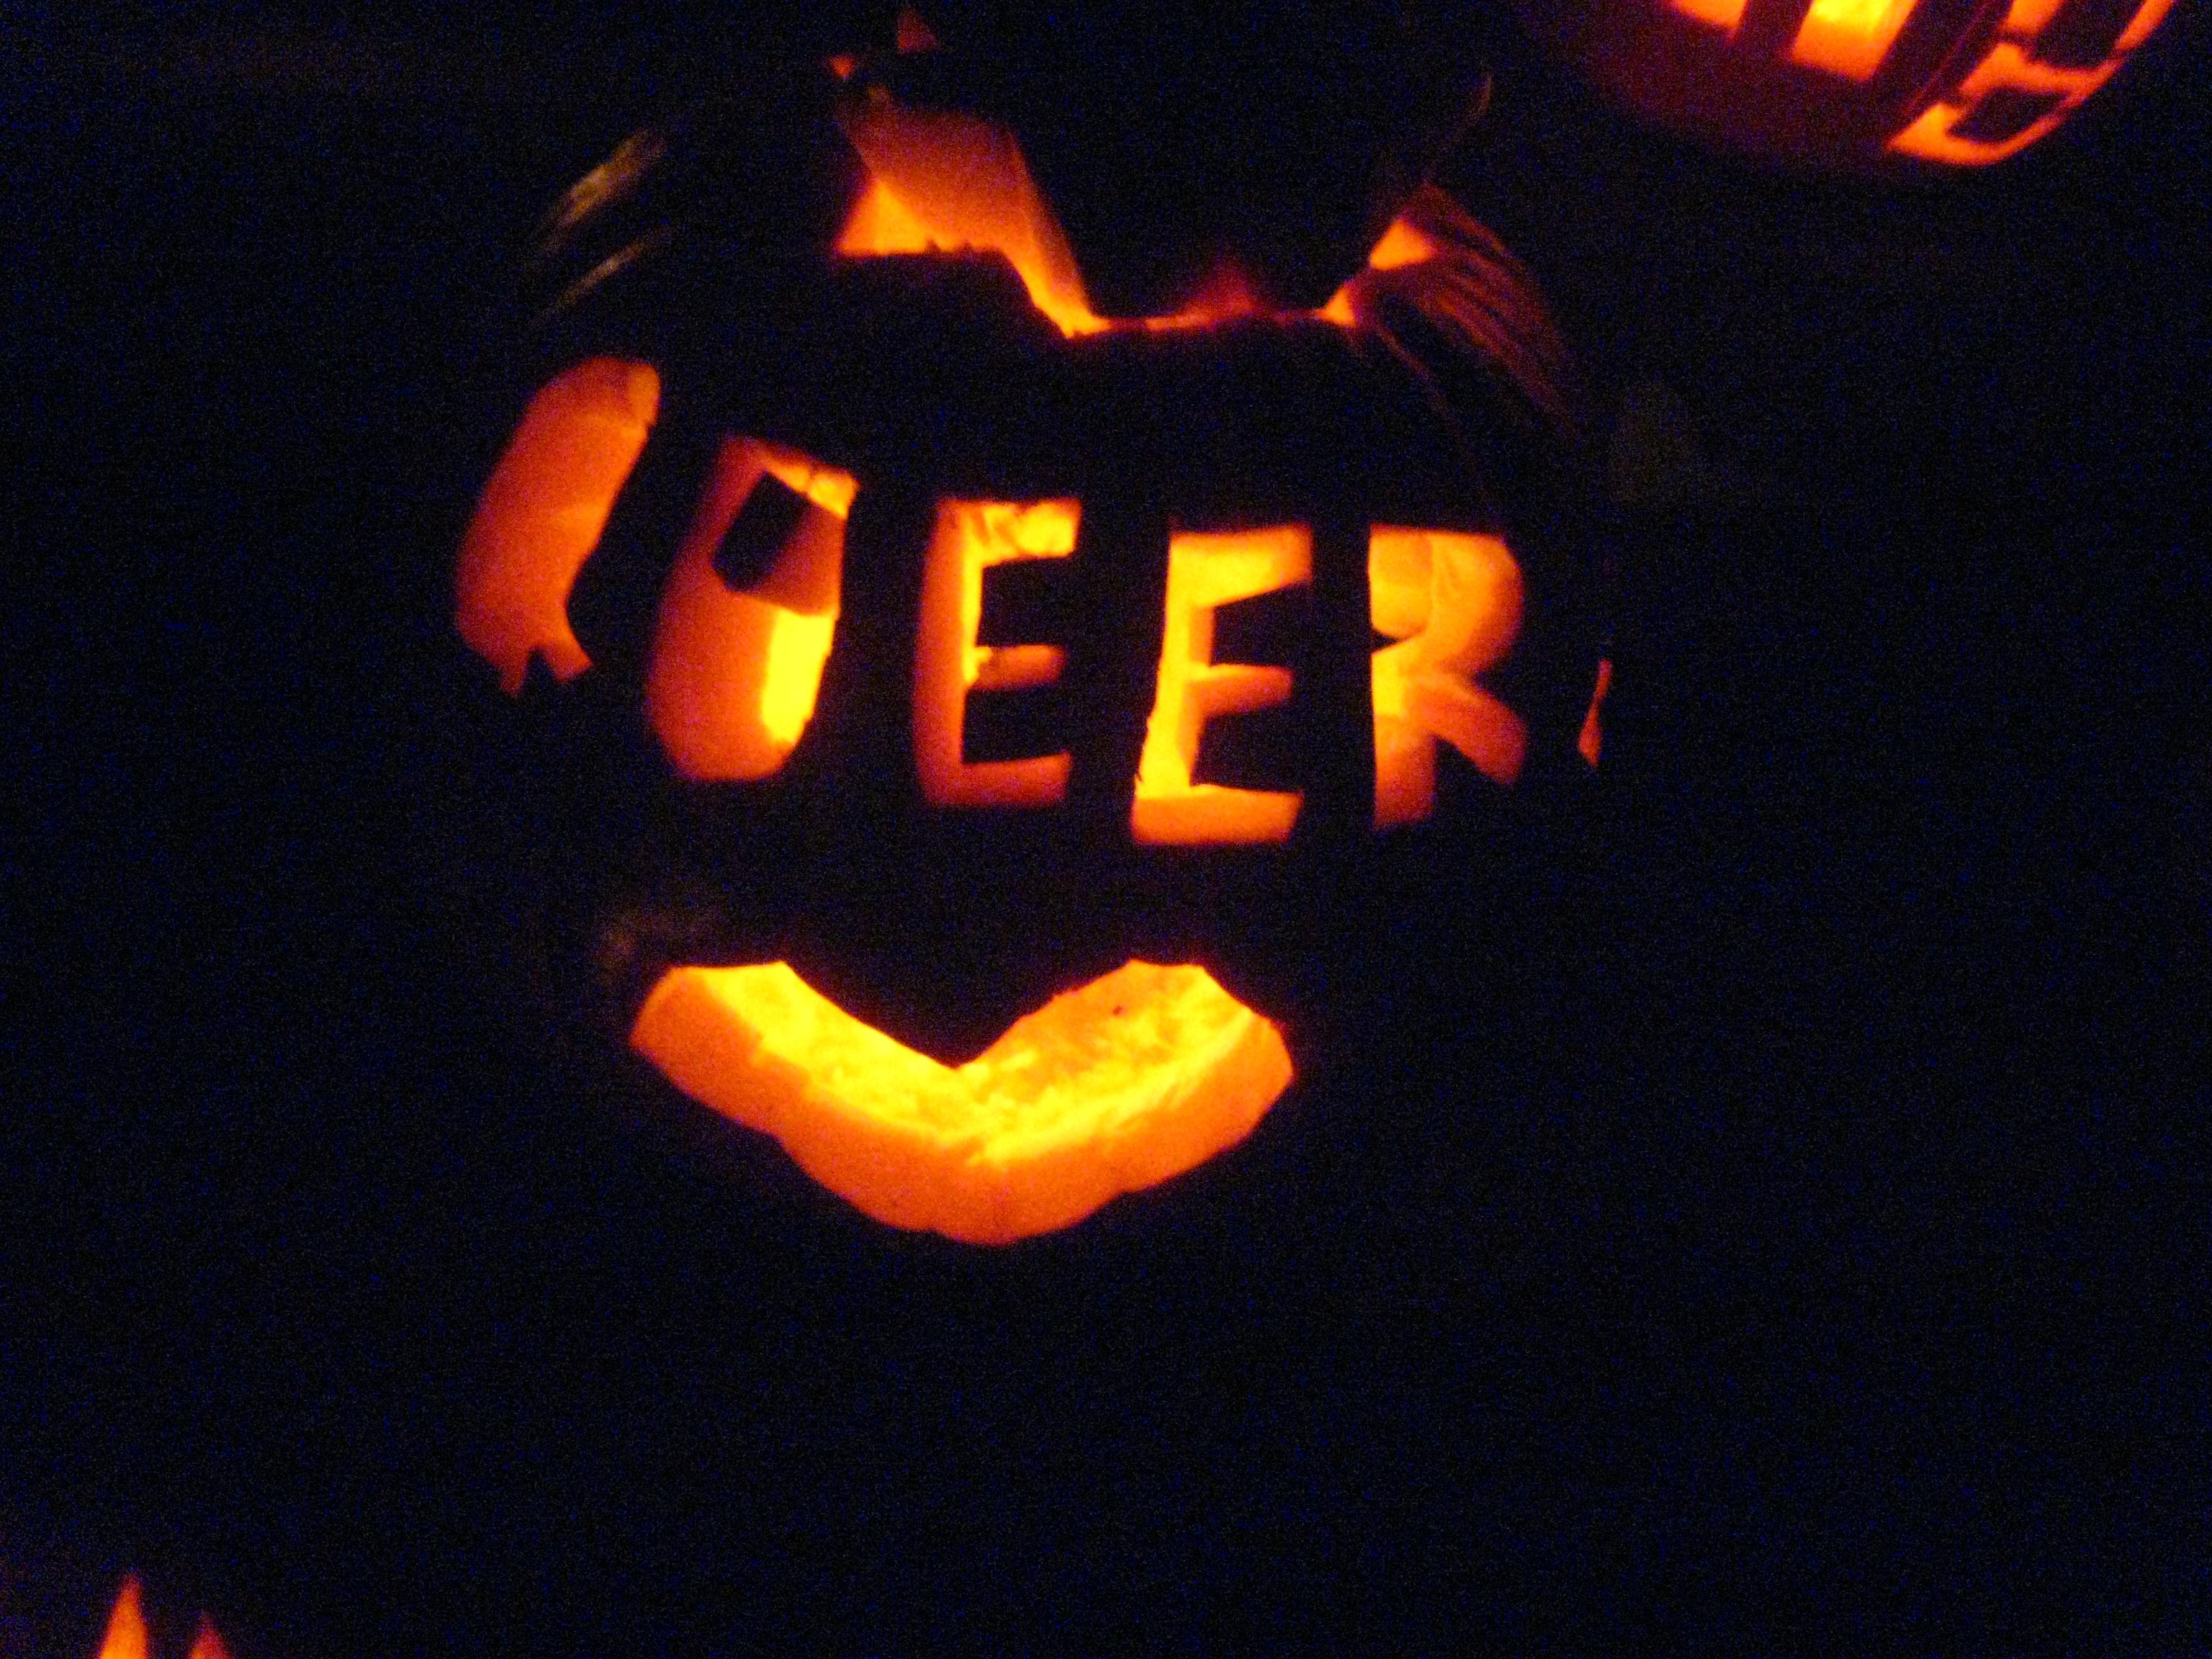 Gay pumpkin carving